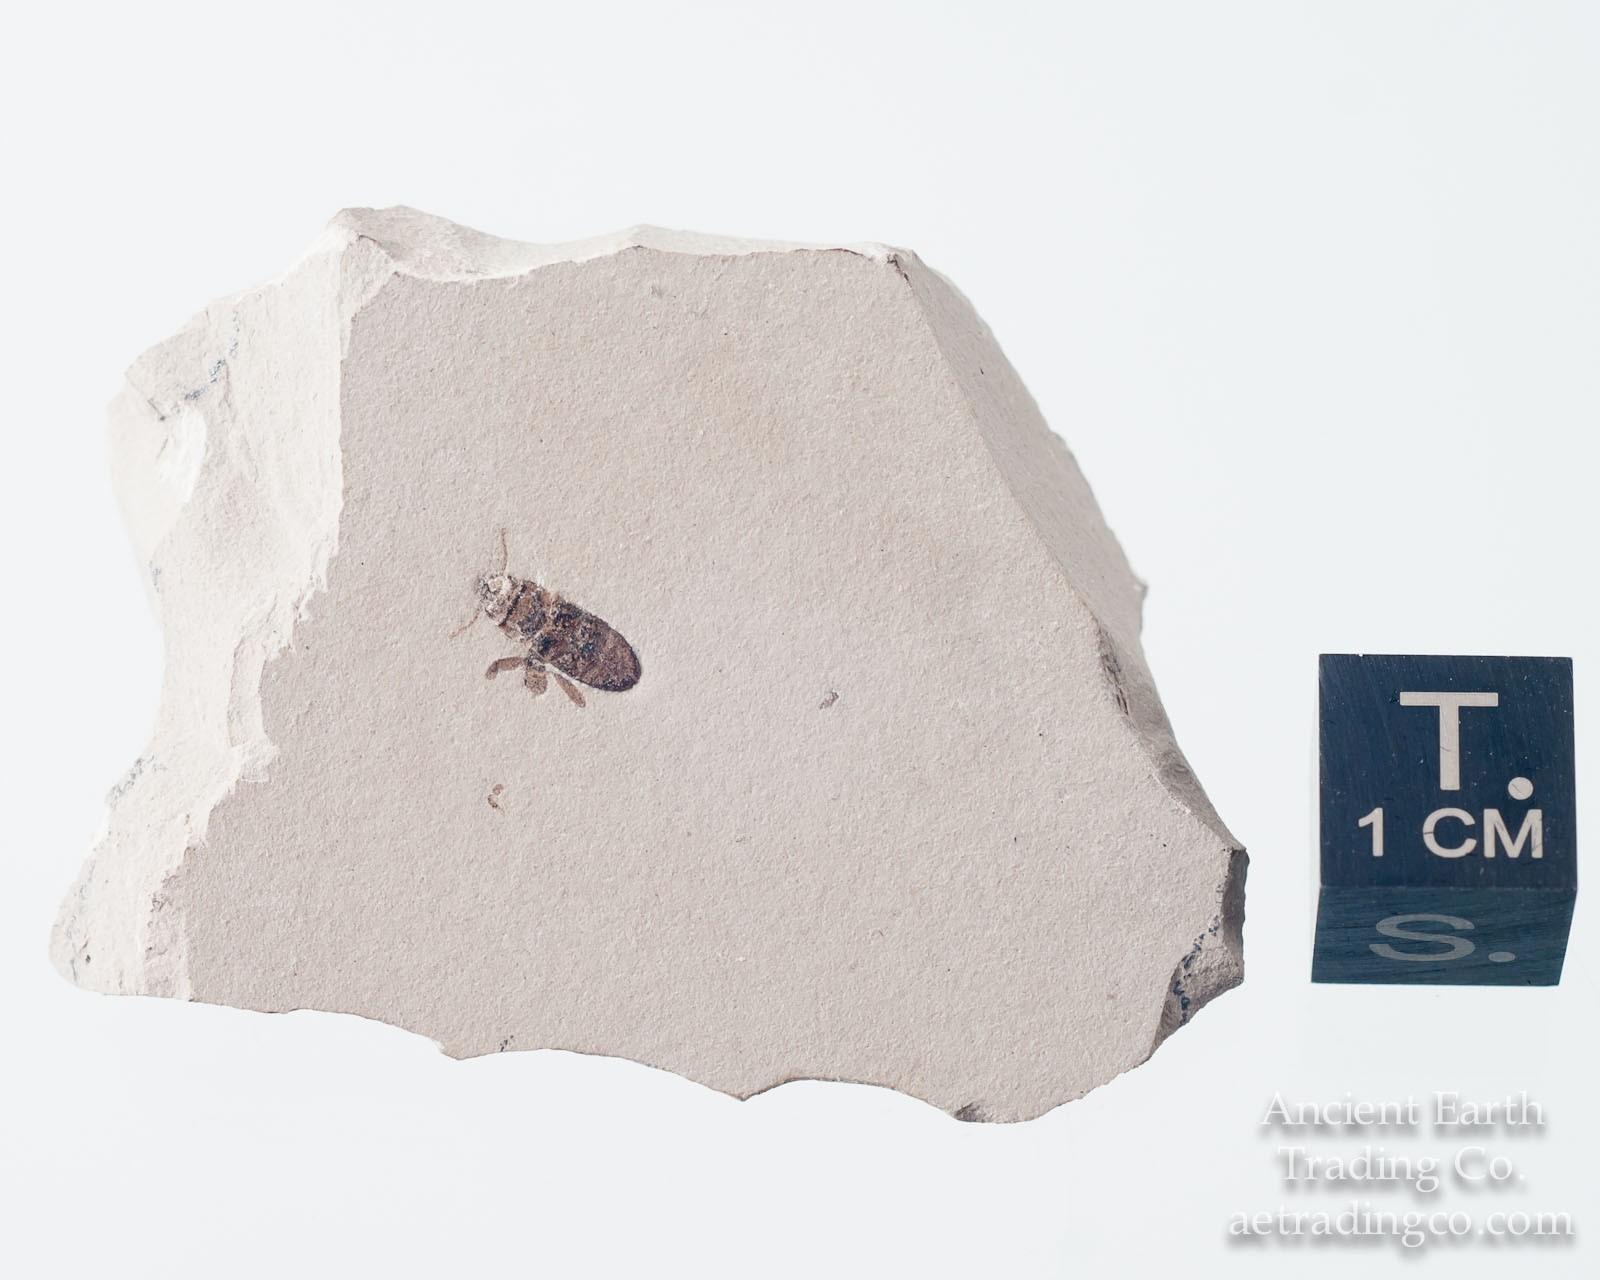 Fossil Jewel Beetle Buprestidae from Green River Fm. Colorado